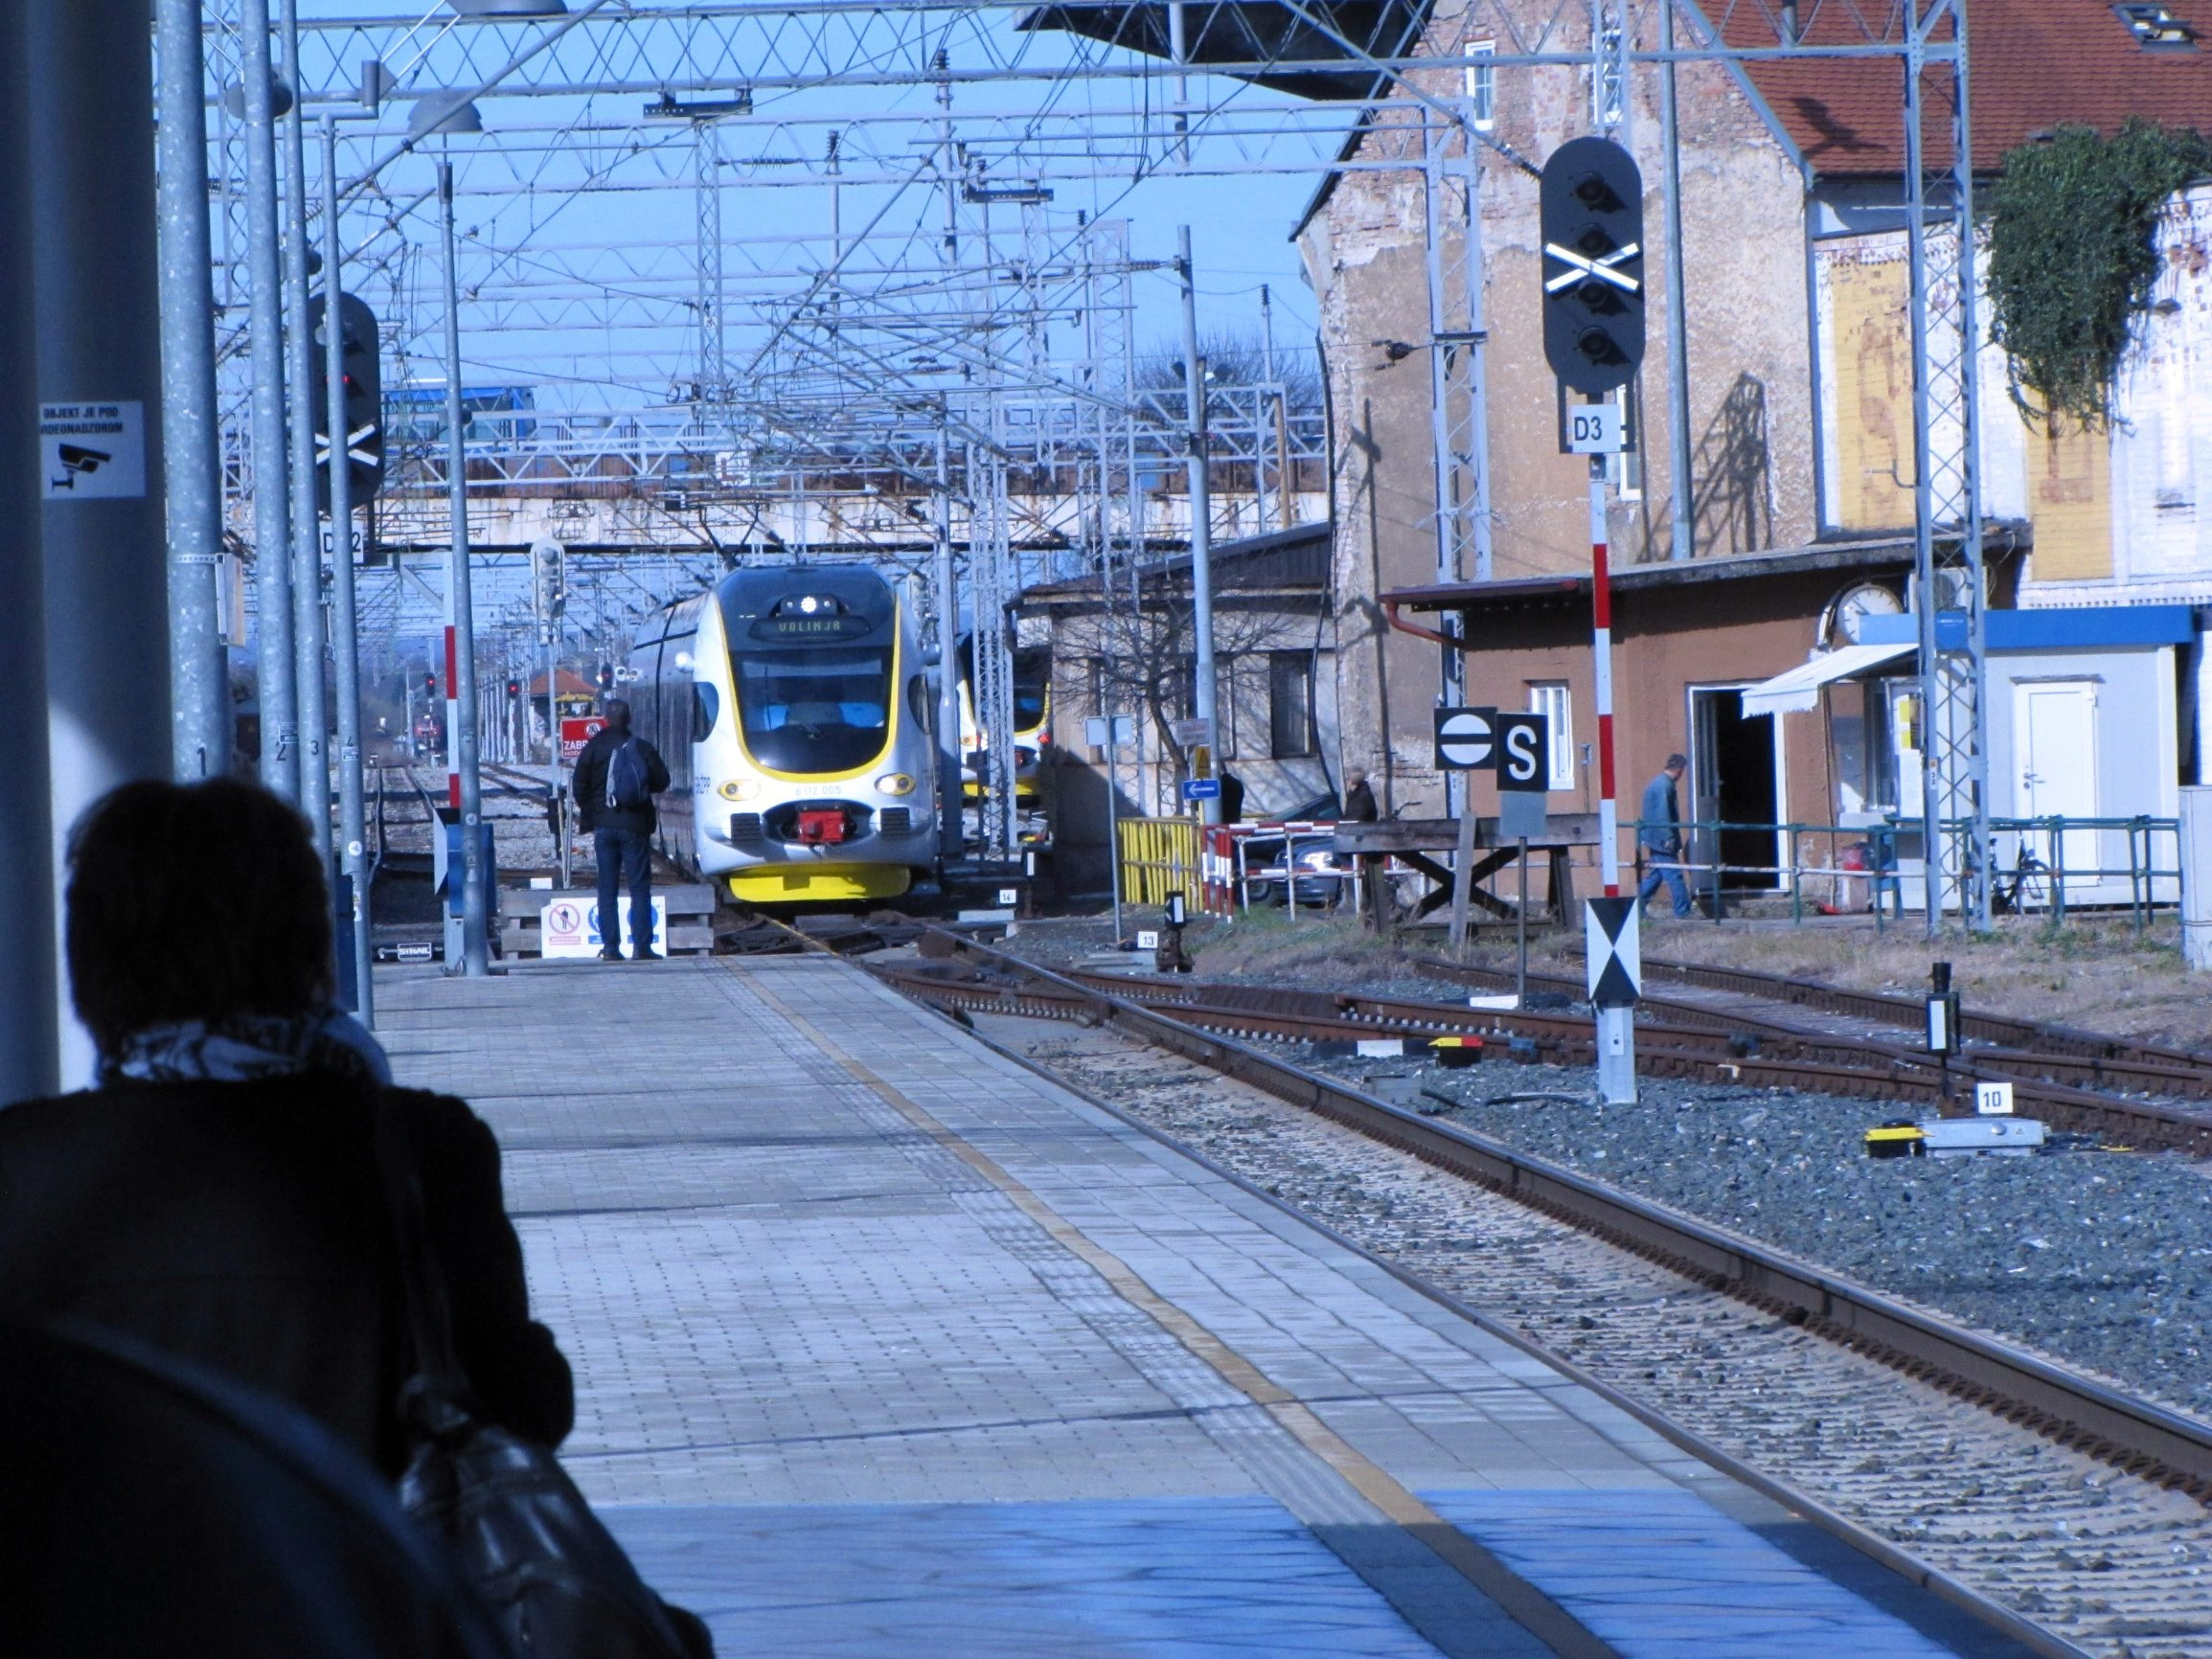 Sisački željeznički kolodvor